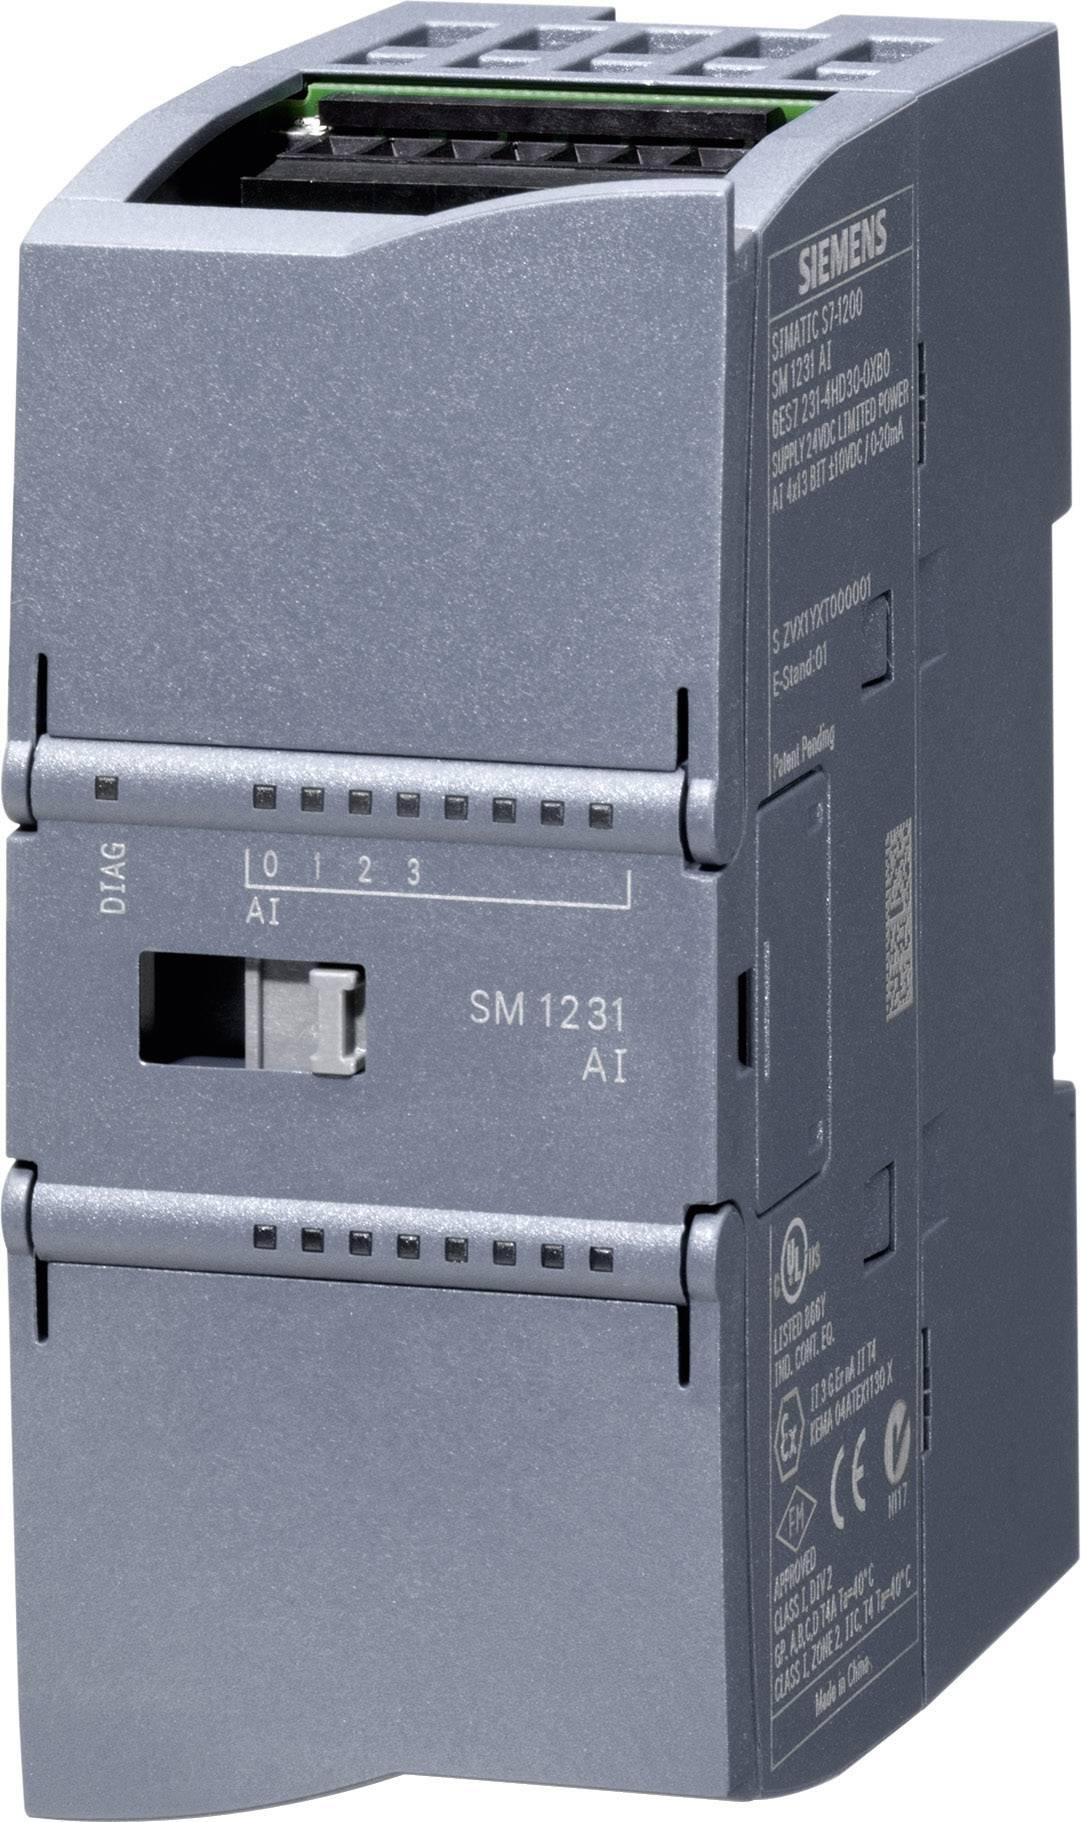 Rozšiřovací PLC modul Siemens SM 1231 (6ES7231-5QF32-0XB0)